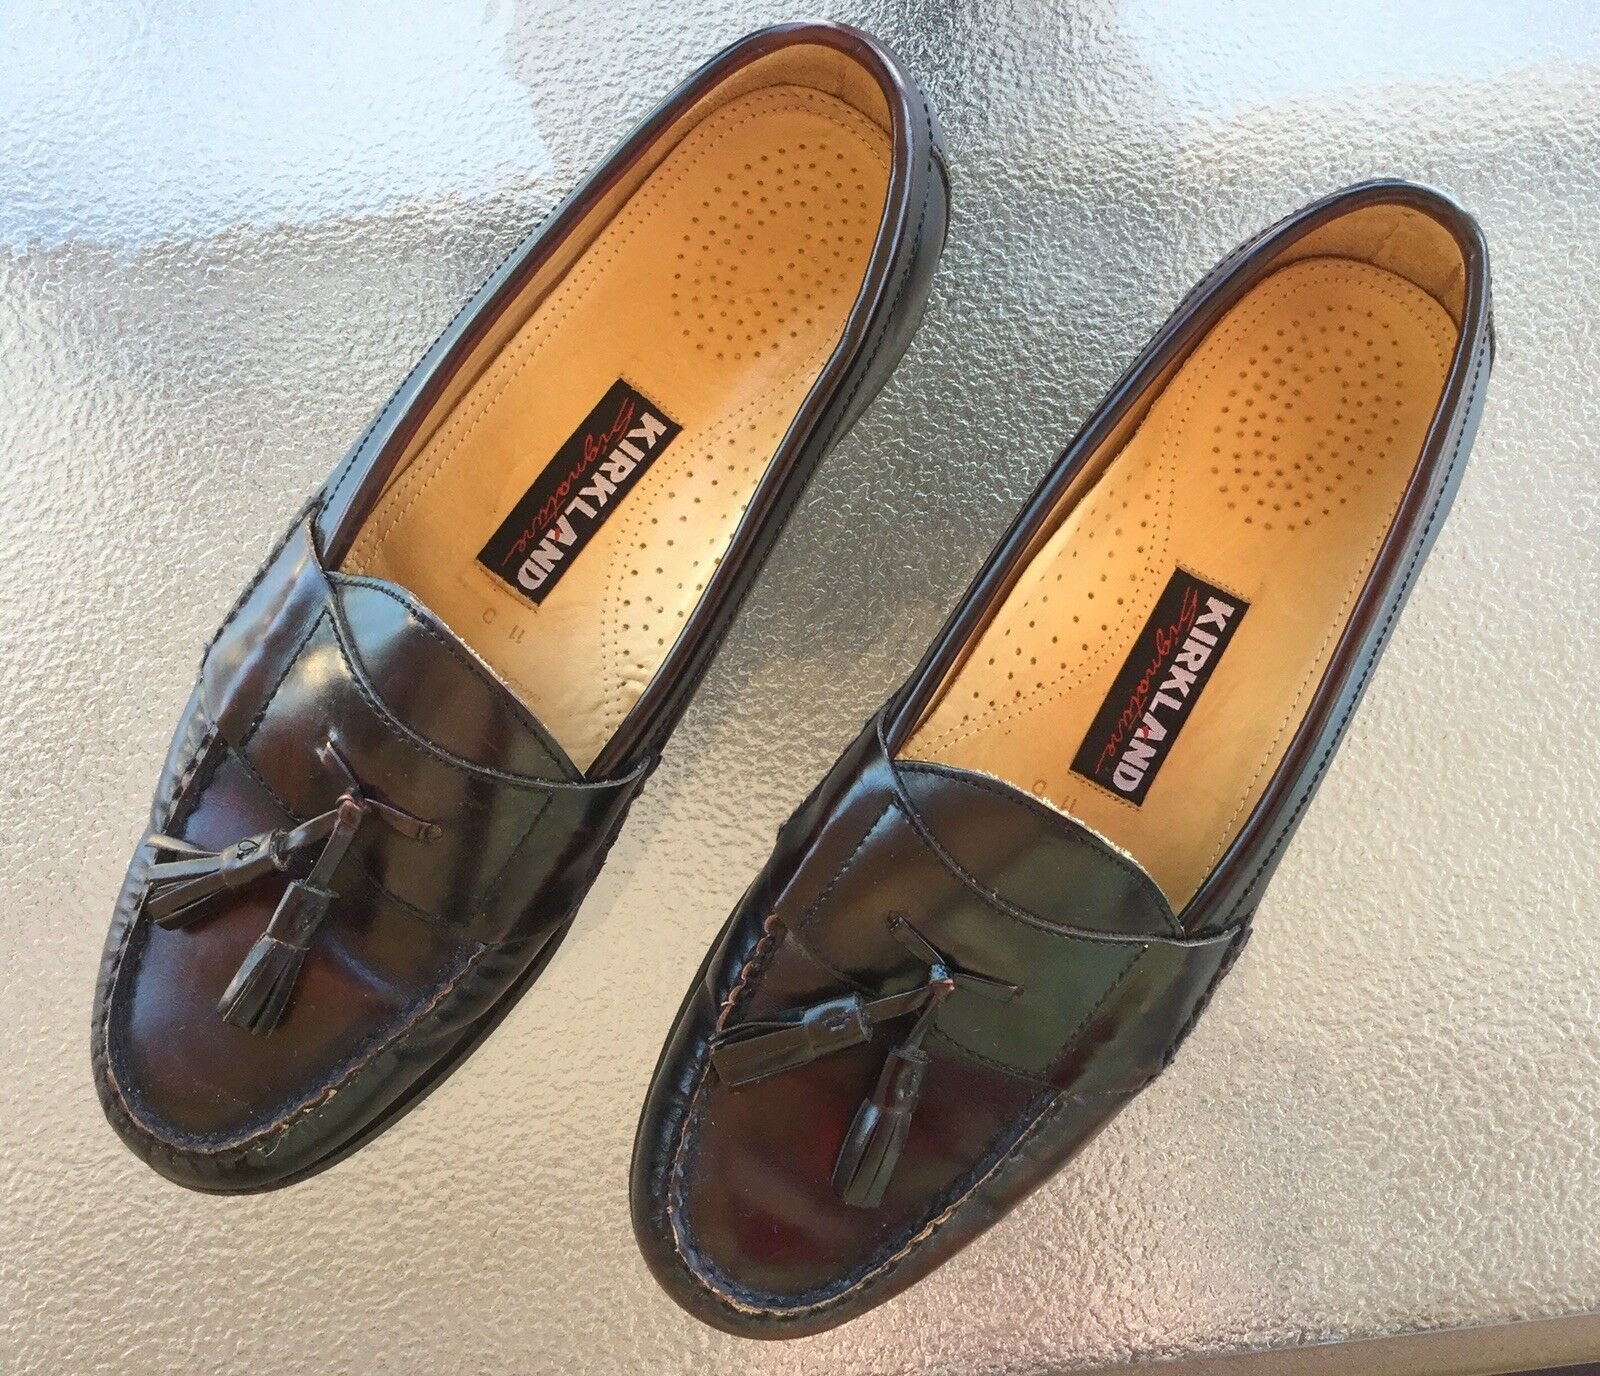 KIRKLAND Signature Men's BURGUNDY Leather Loafers SHOES Moc Toe Tassel Sz 11D